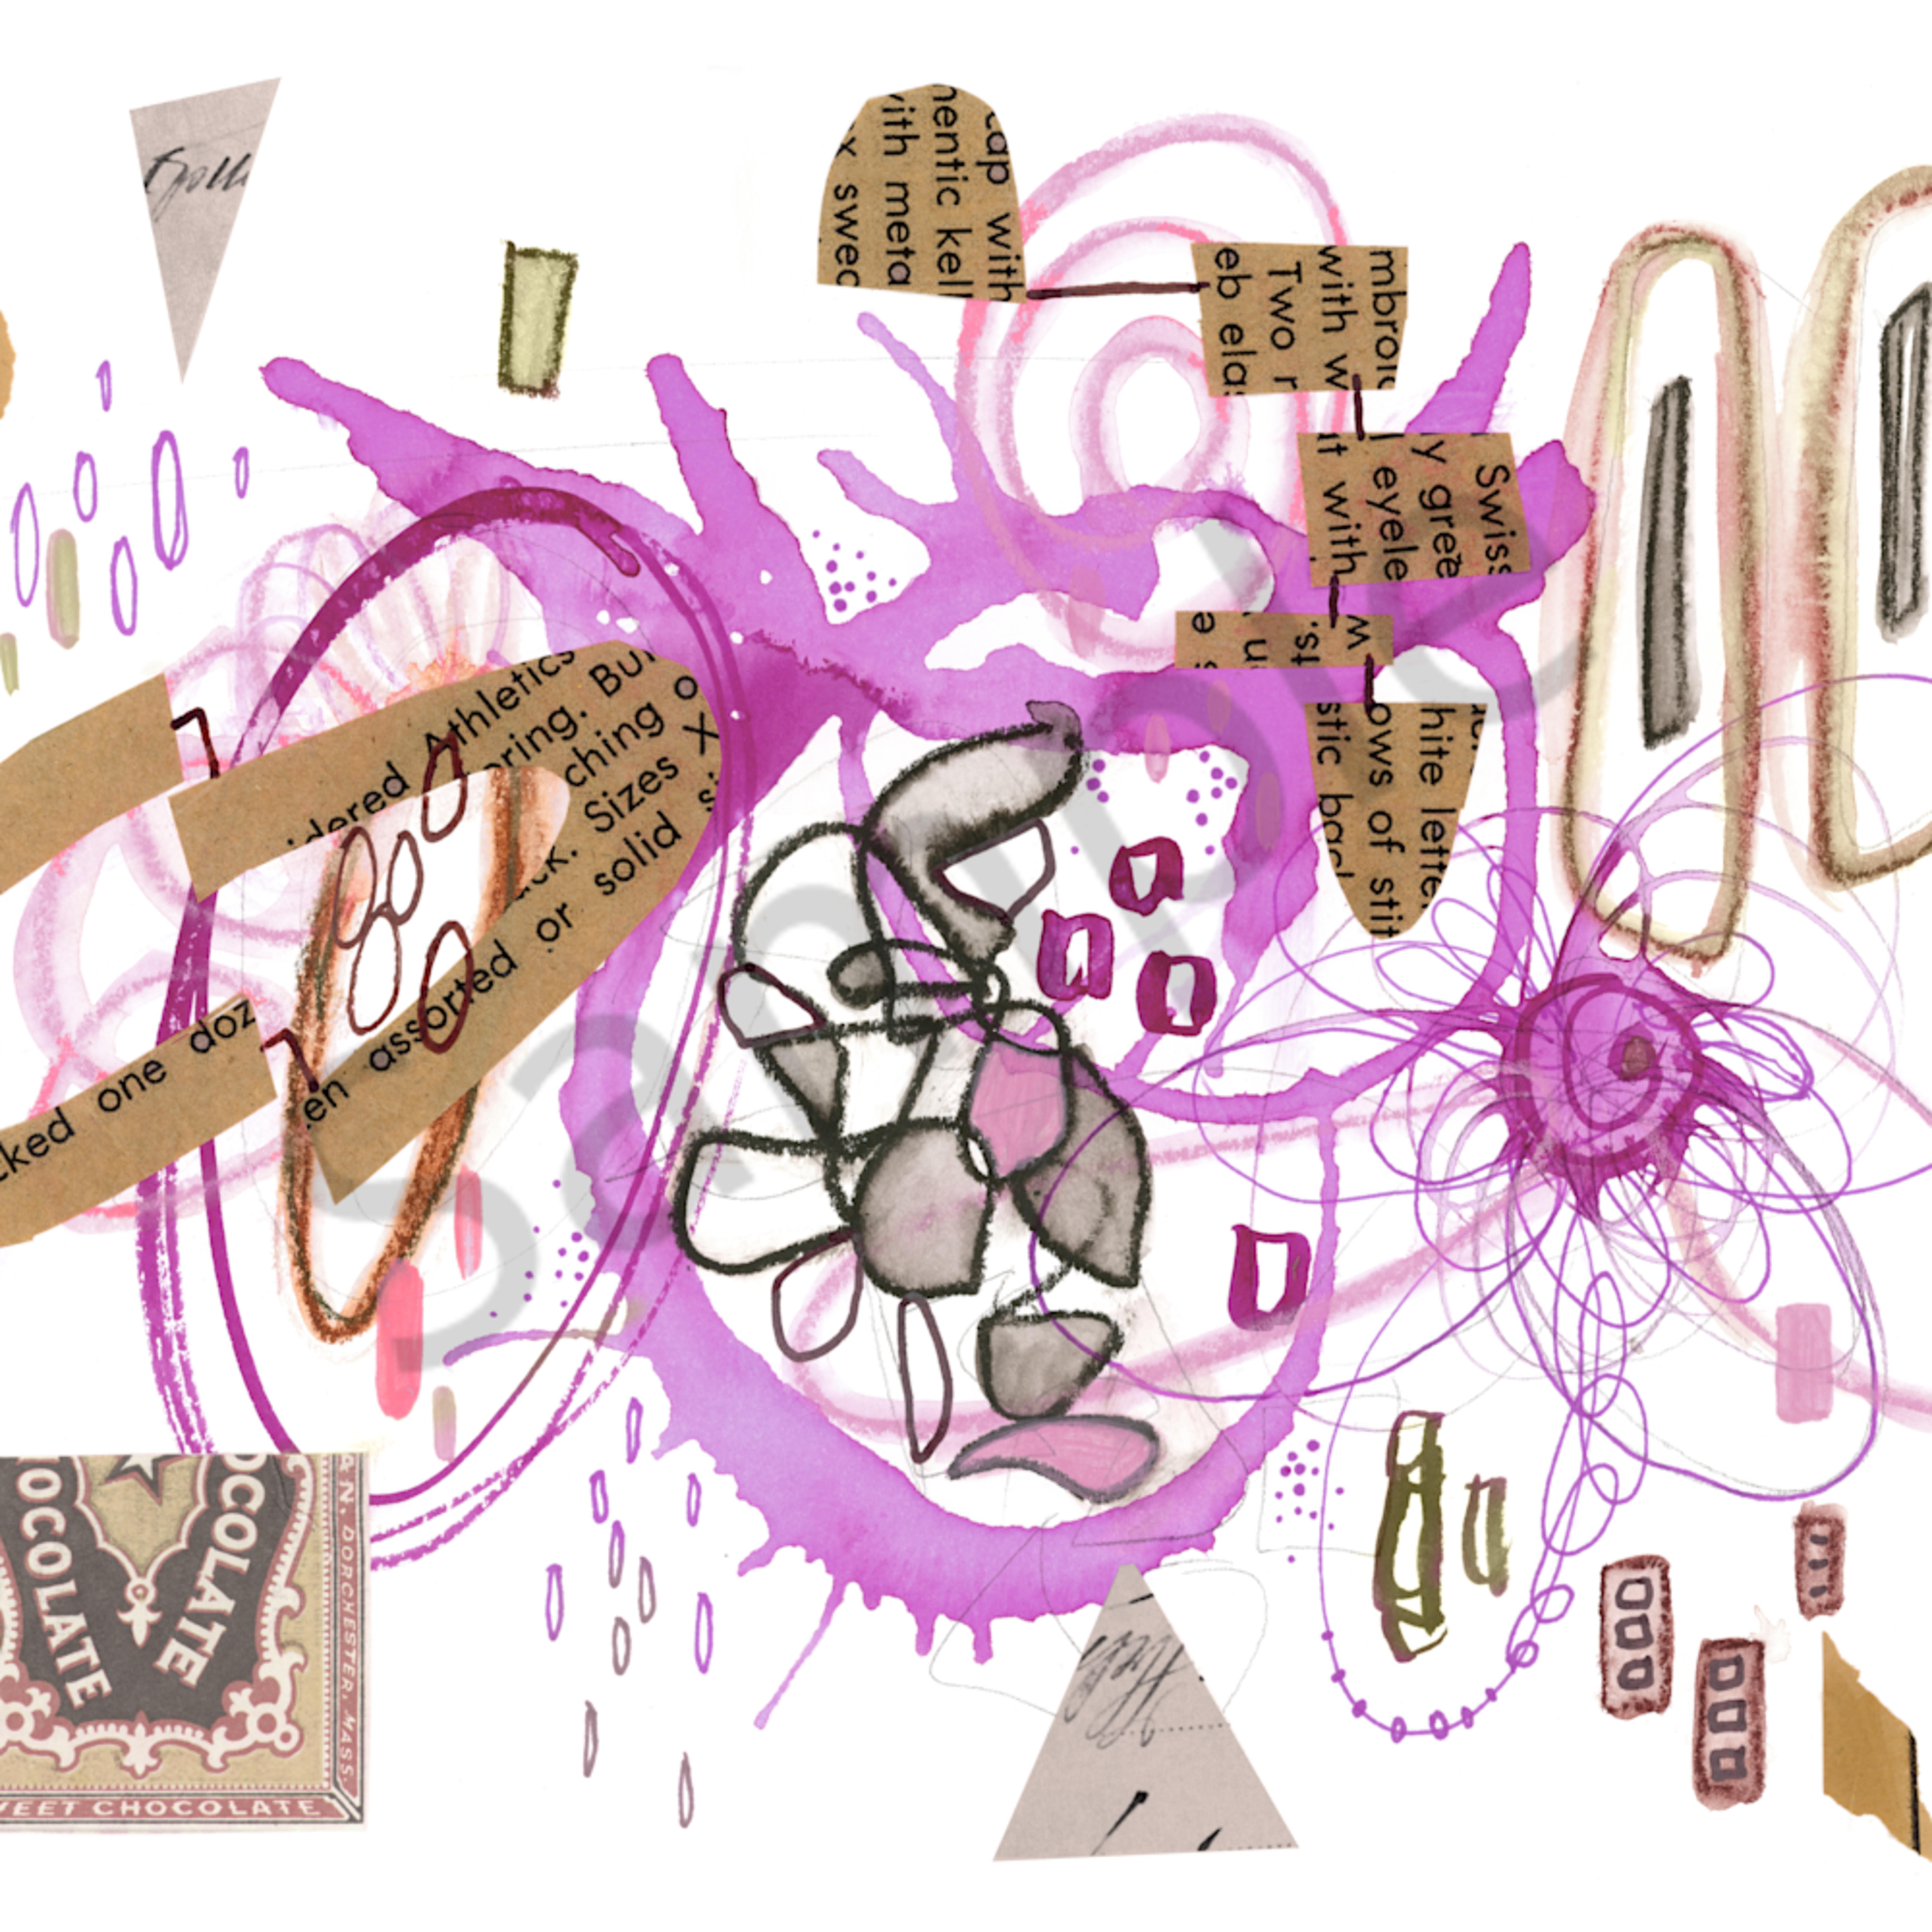 Abstract series1 pinkchoc 02 frplpm